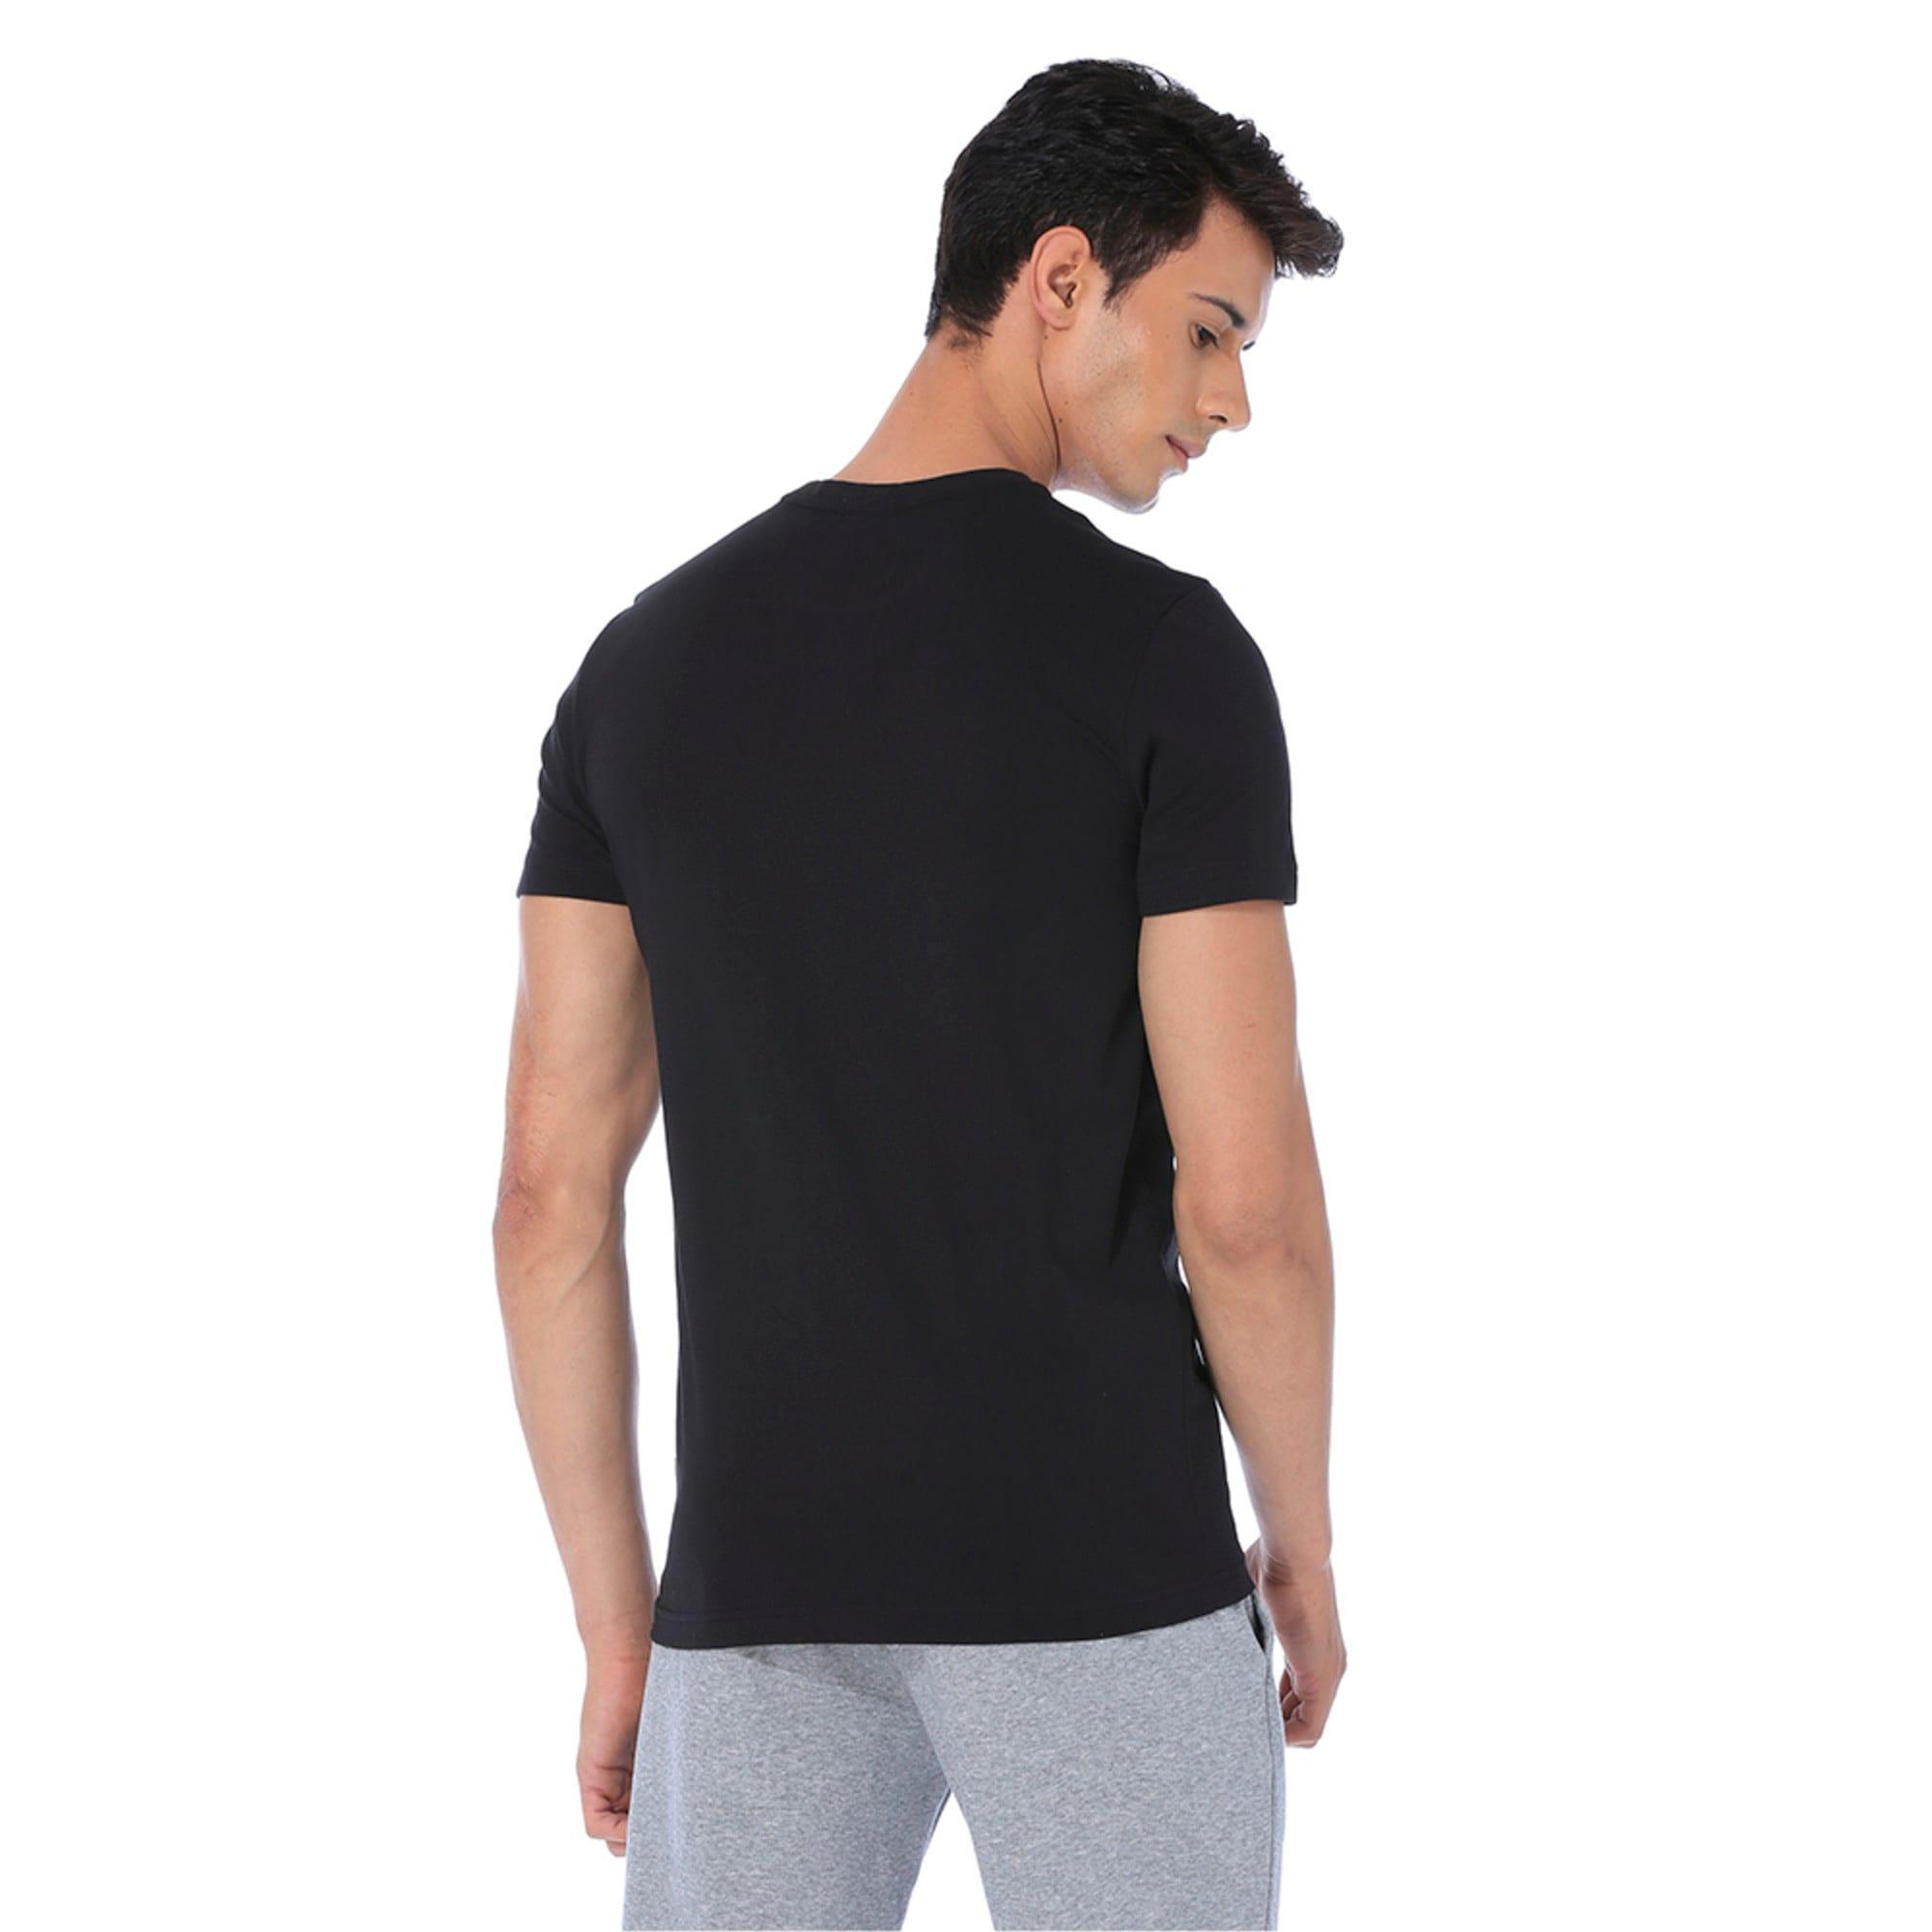 Thumbnail 5 of Men's Essentials Small Logo T-Shirt, Cotton Black, medium-IND